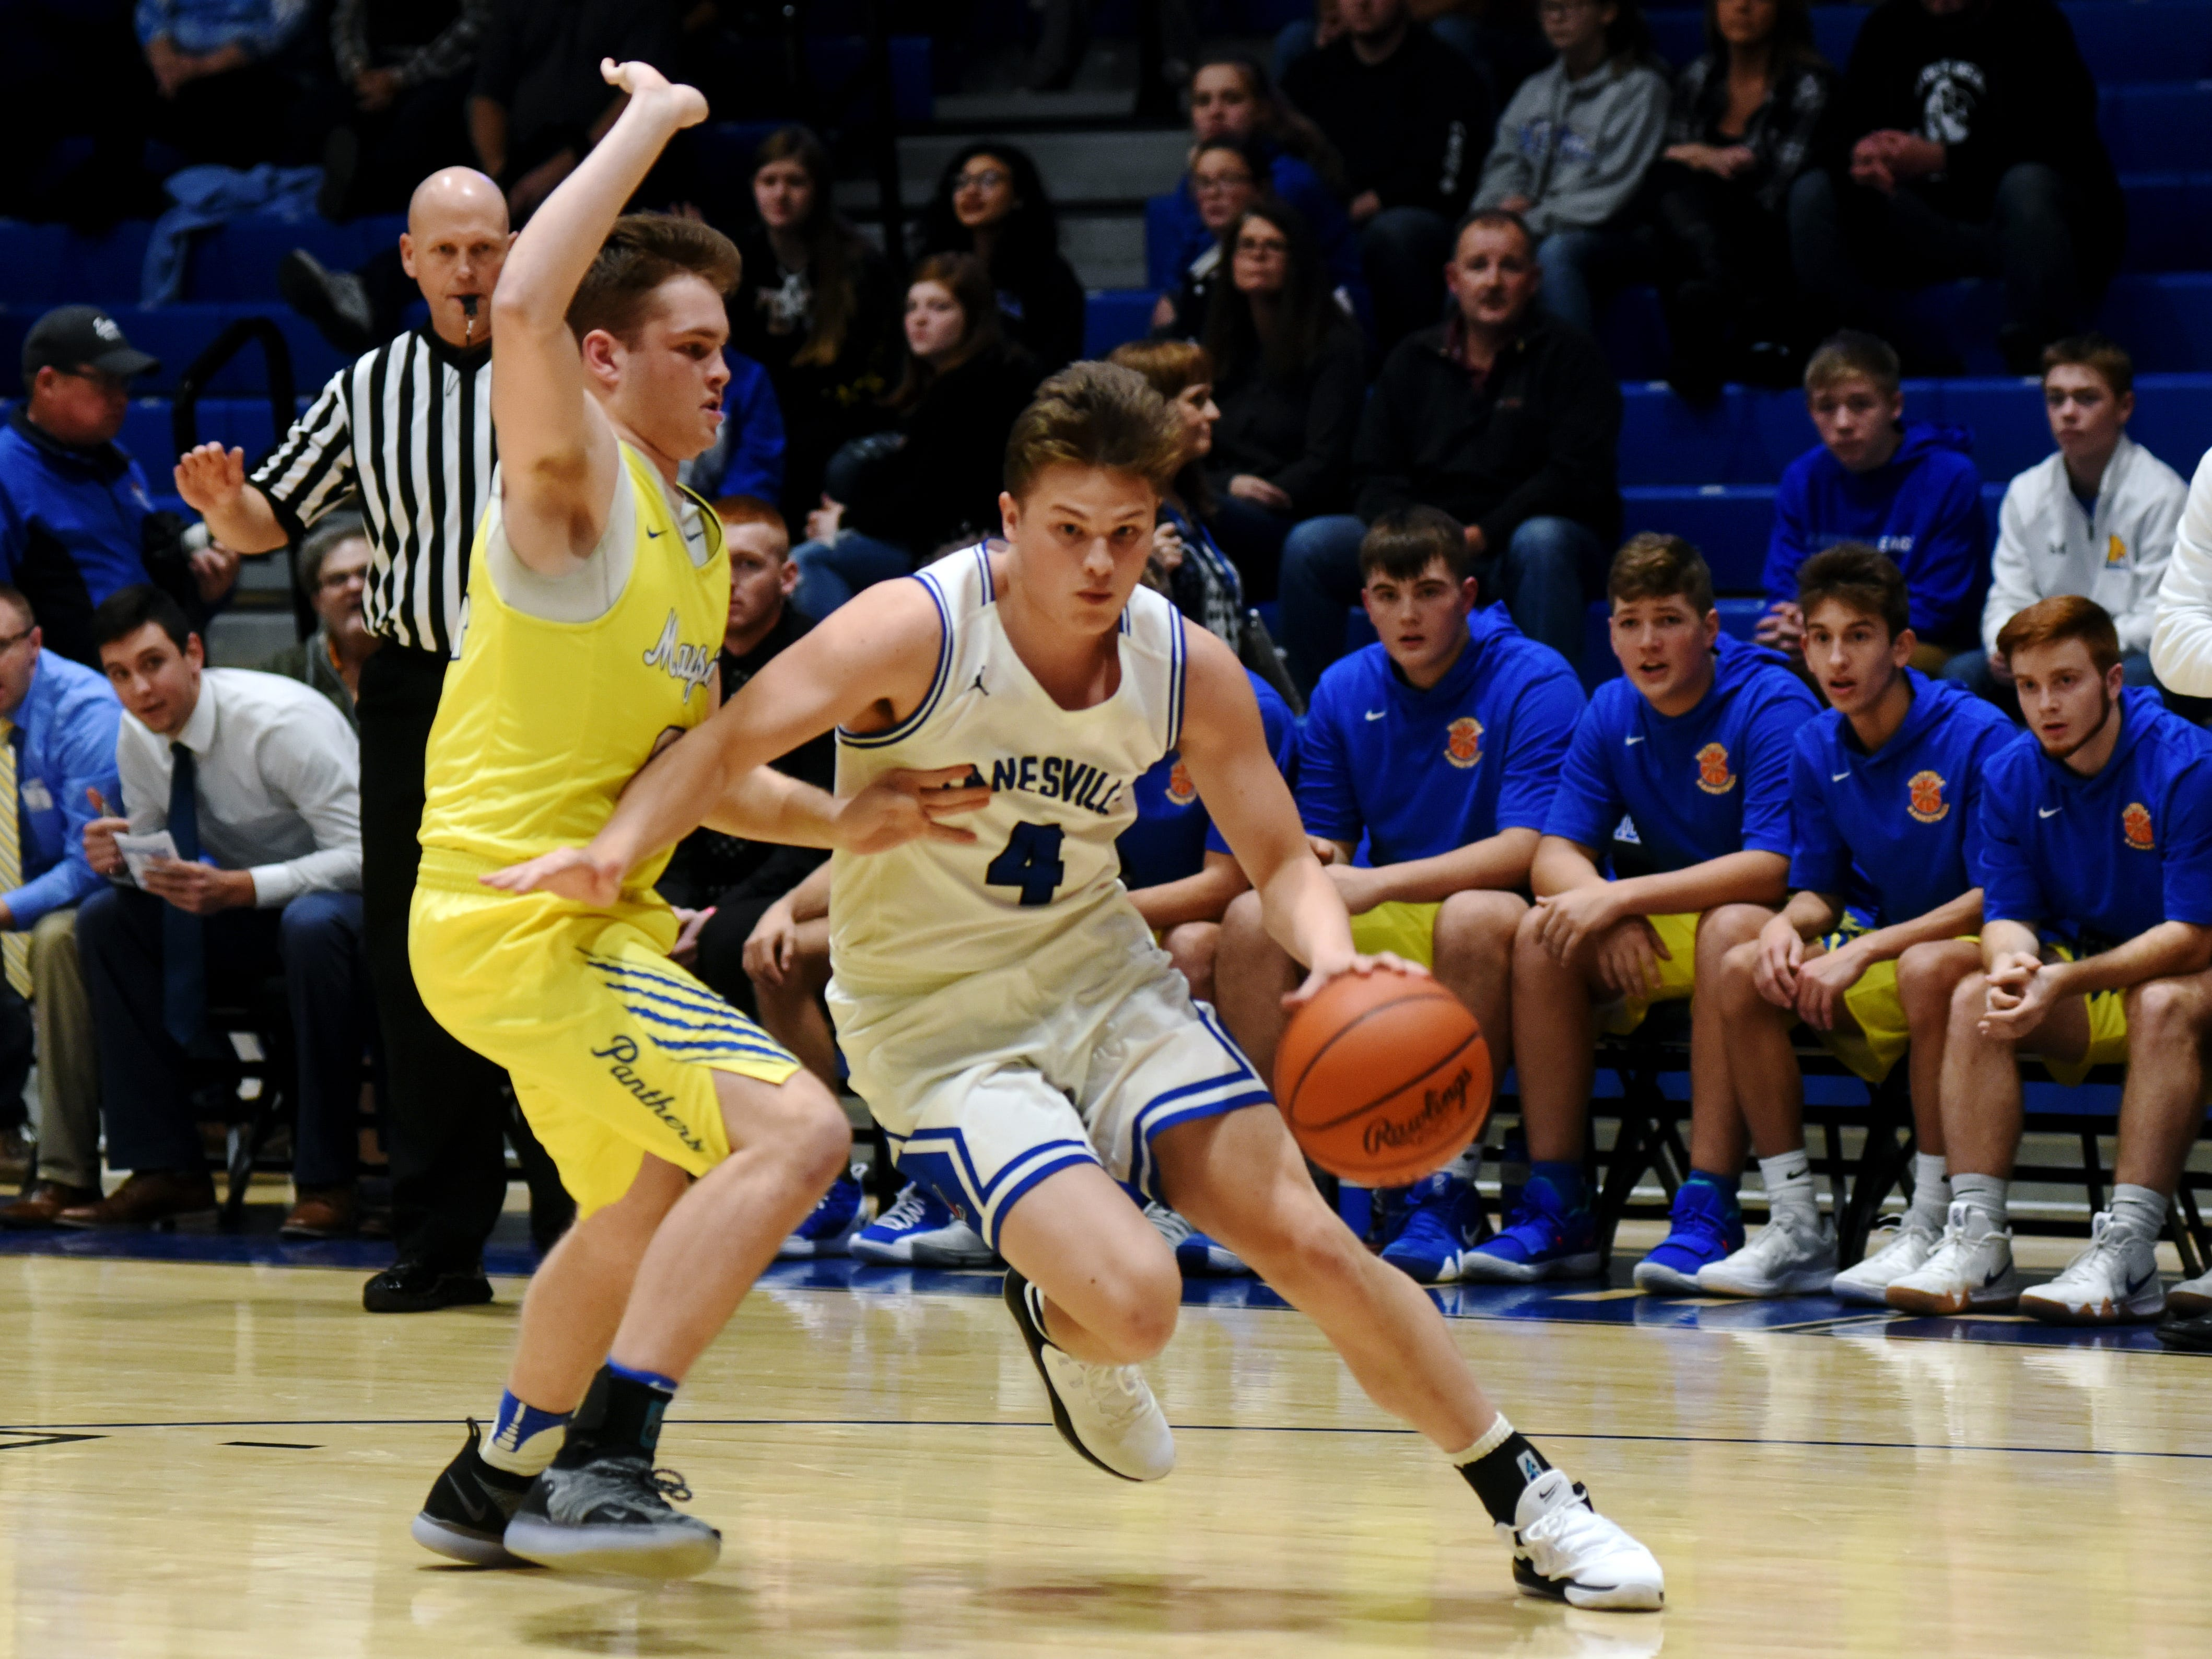 Clayton Foreman, of Zanesville, drives to the basket against Maysville's Kaiden Hartman.